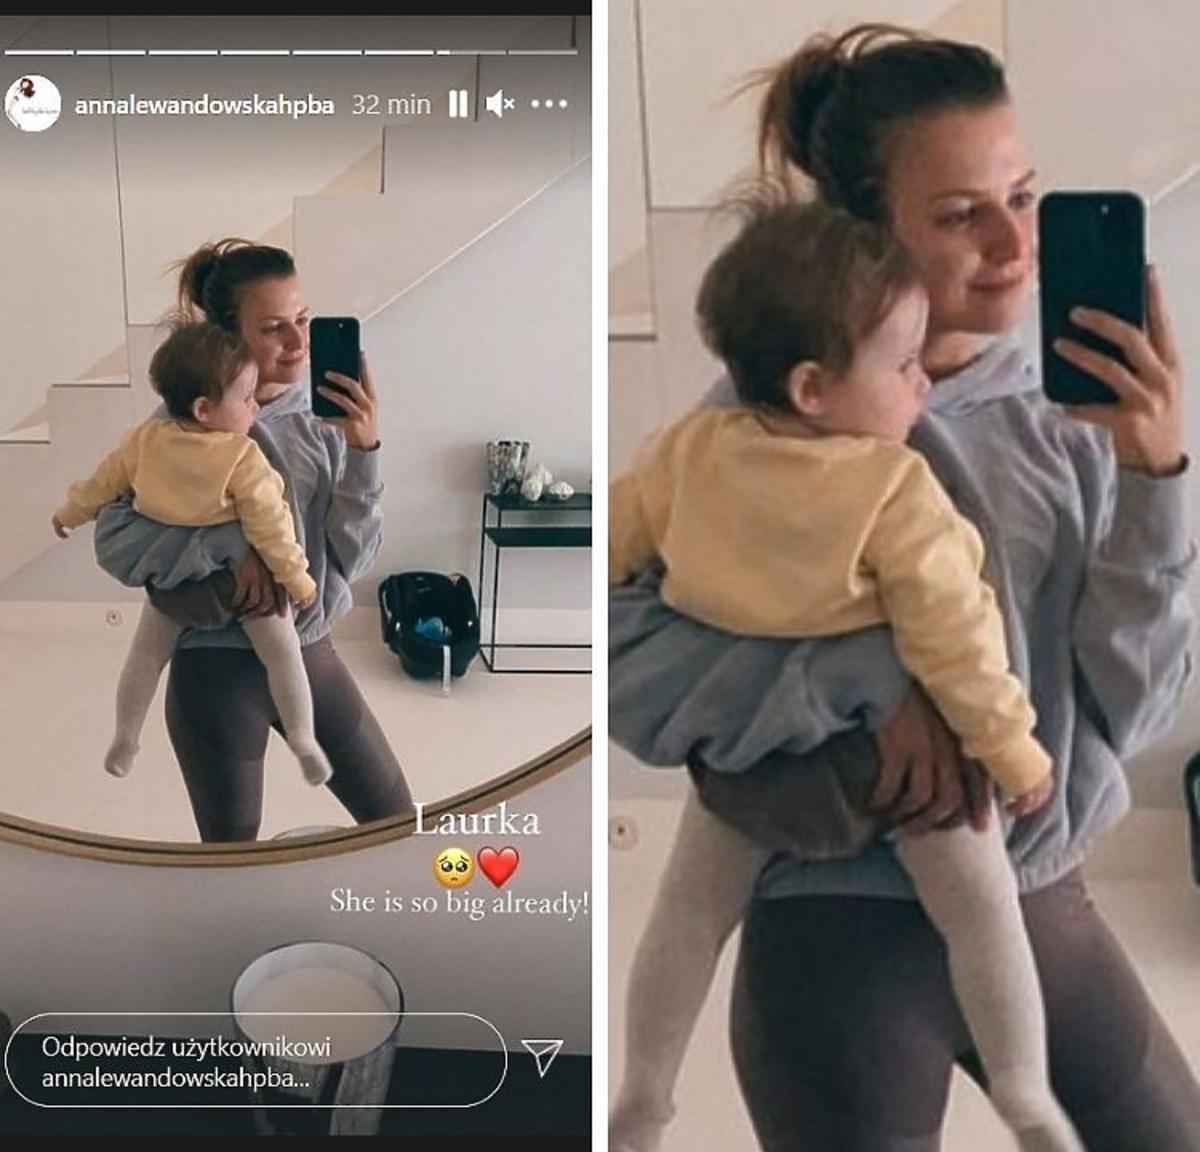 Anna Lewandowska pokazała twarz Laury